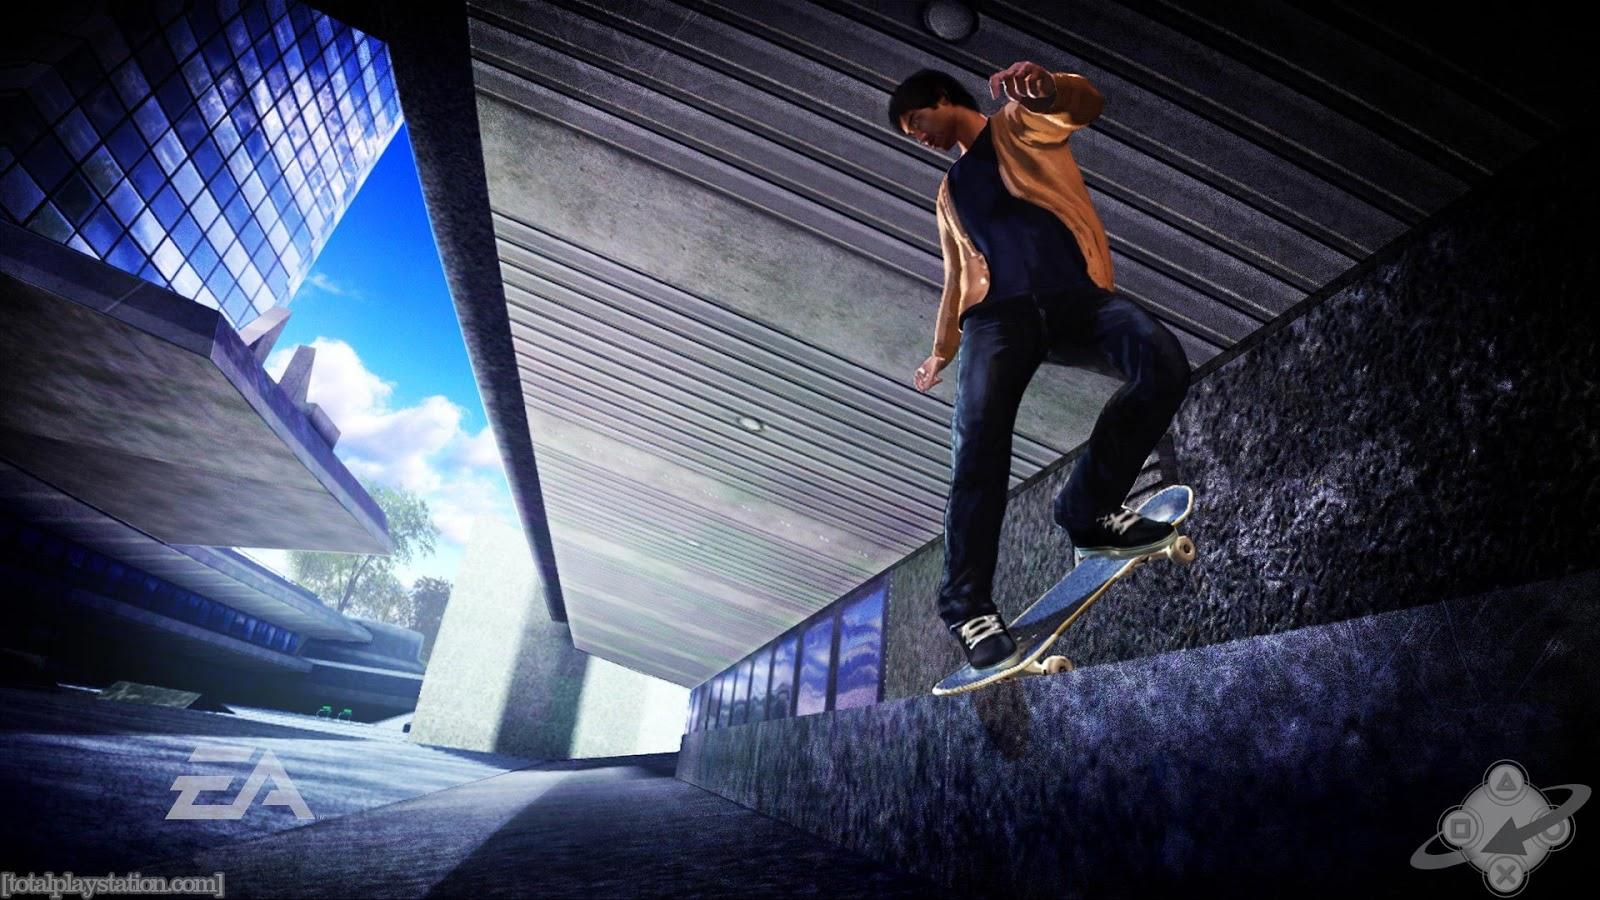 Avenged Sevenfold 3d Wallpaper Wallpapers Hd For Mac Skateboarding Wallpaper Hd